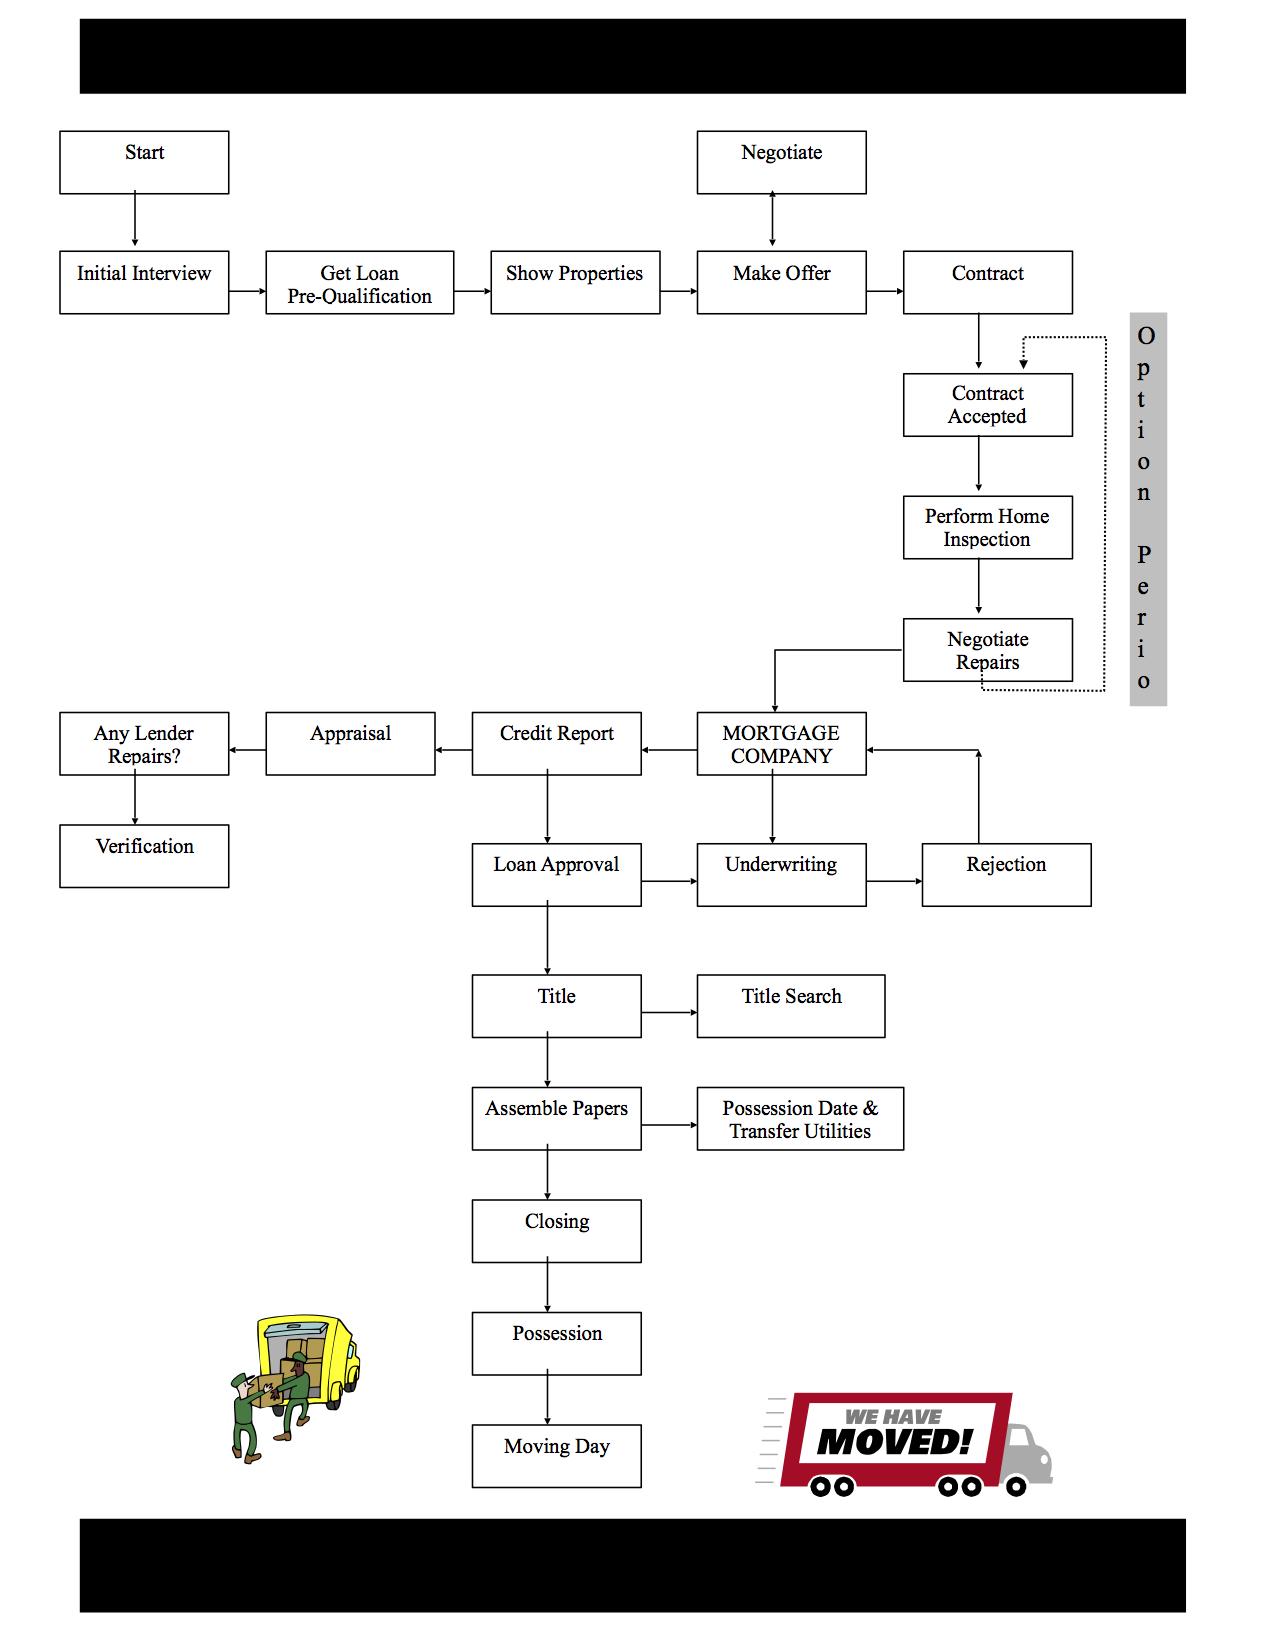 flowchart-buying-process-generic